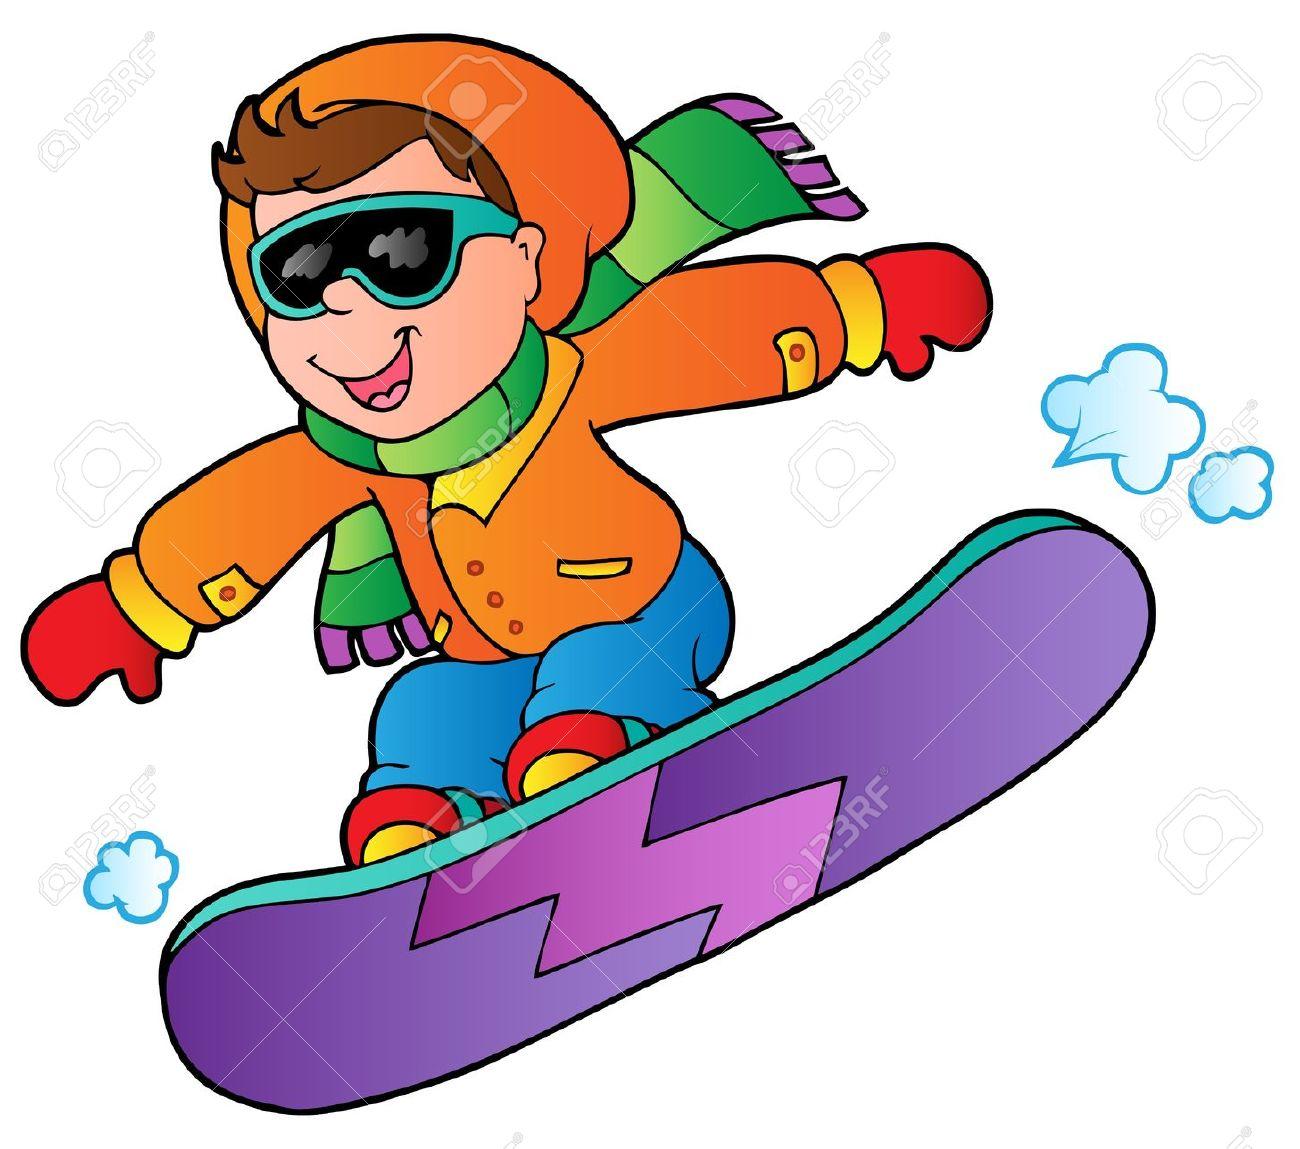 Clip art of snowboarding-Clip art of snowboarding-2